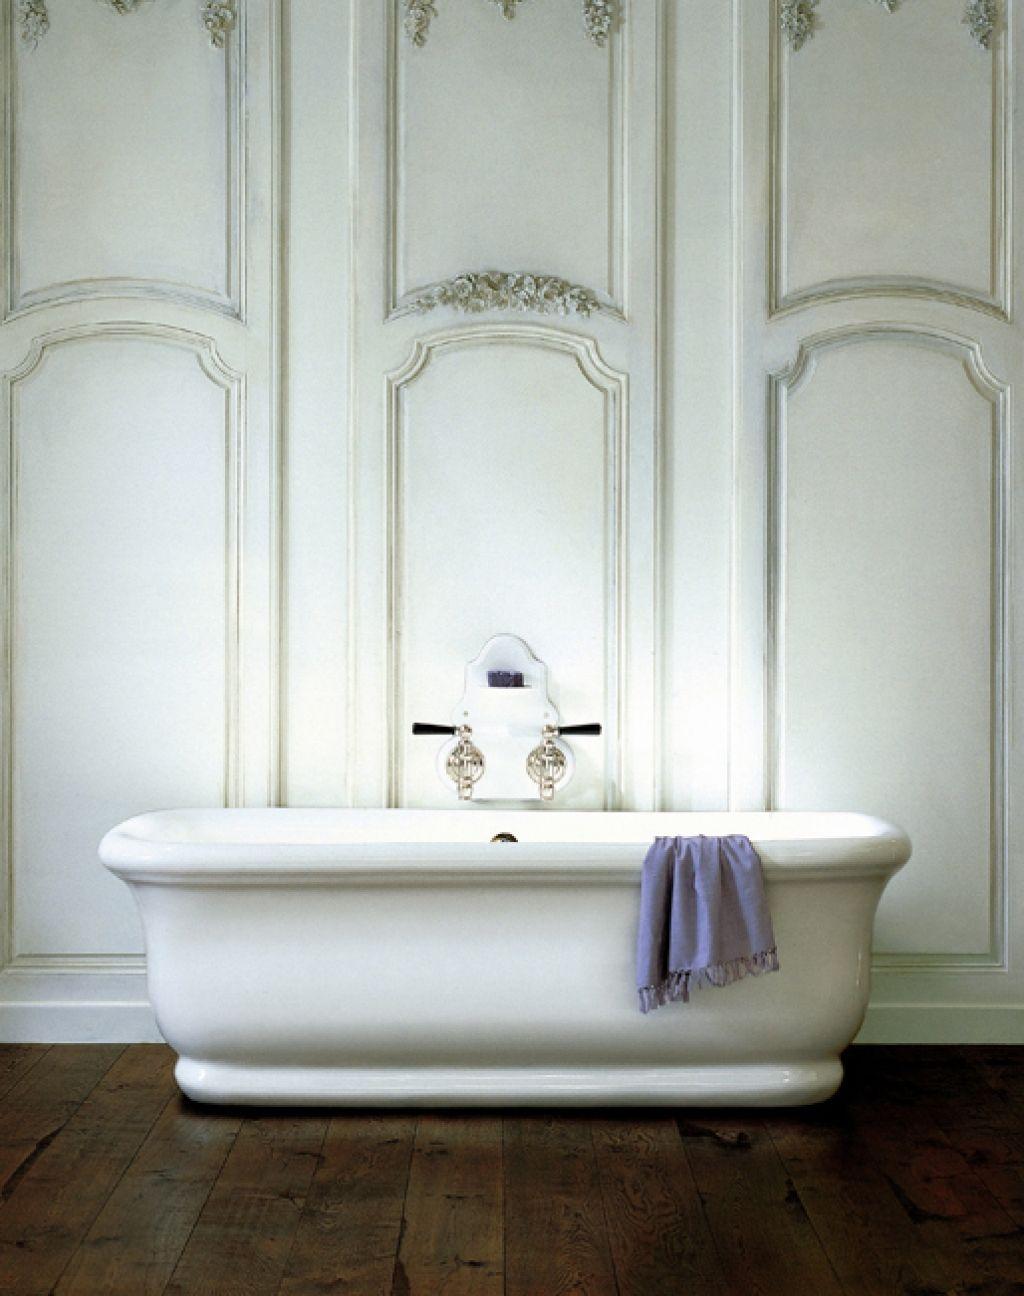 Paris Bath without feet / | The Water Monopoly | Baños | Pinterest ...